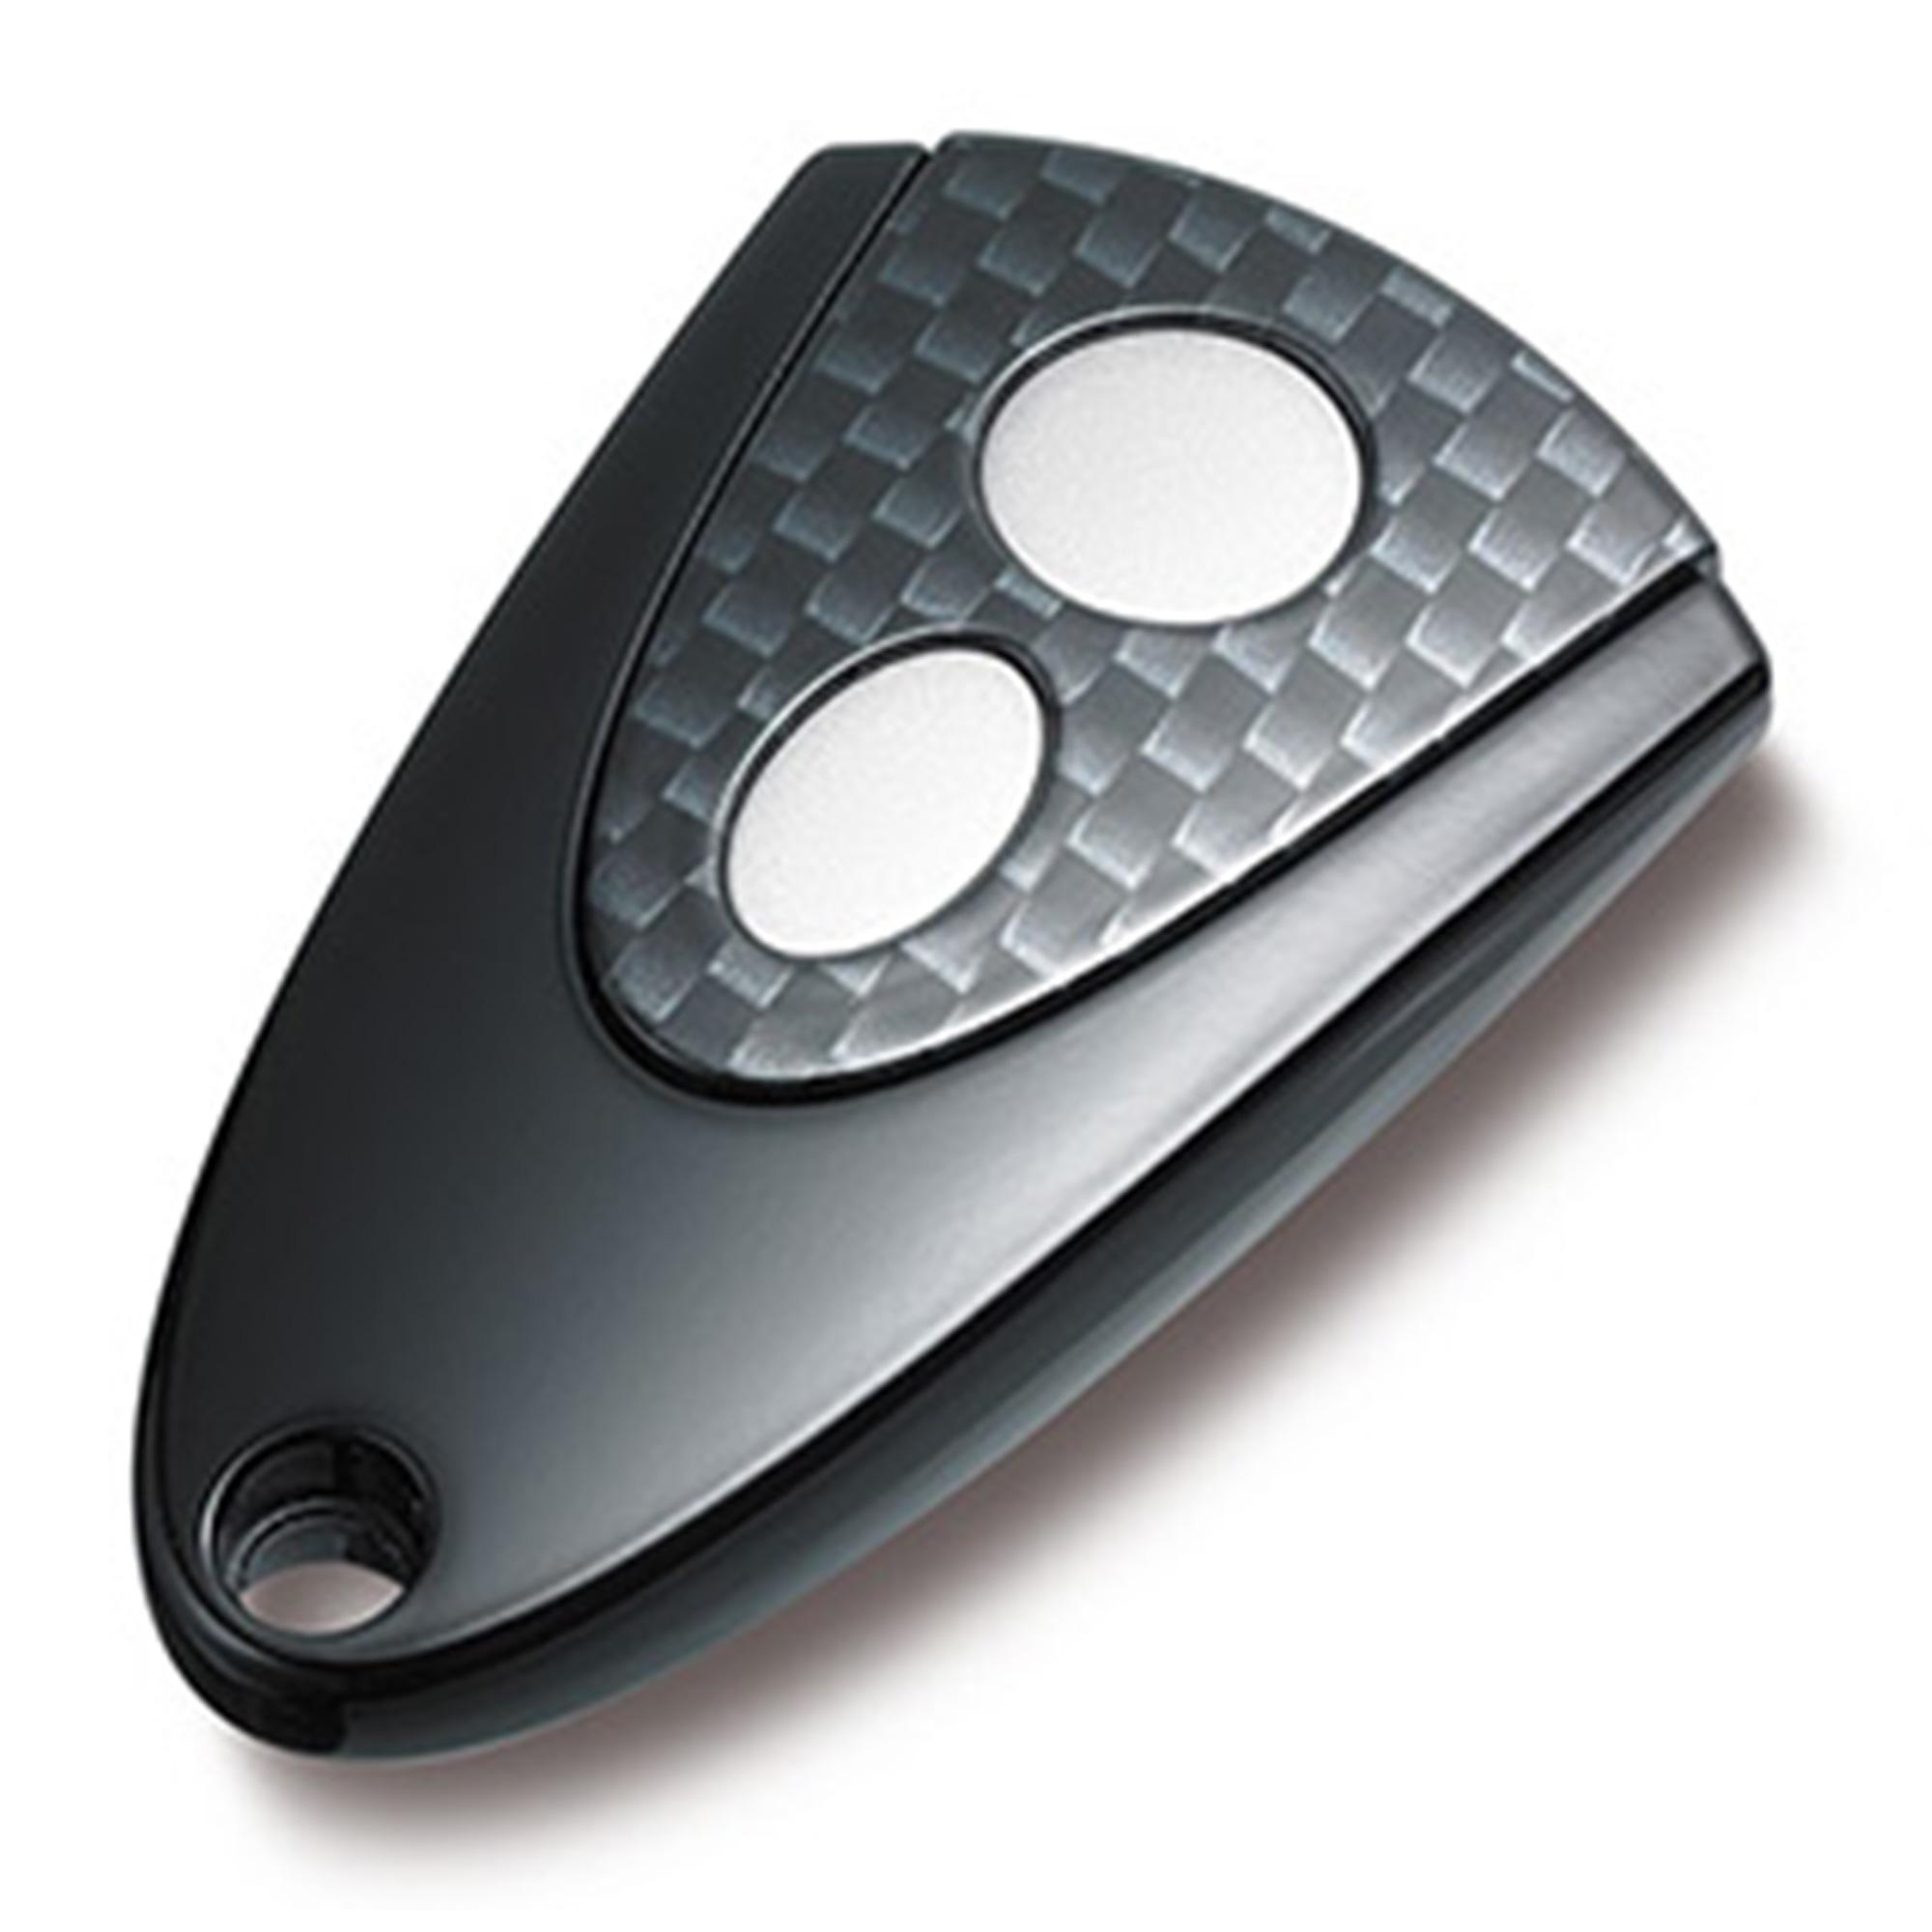 Novoferm Handsender Novotron 512 Design